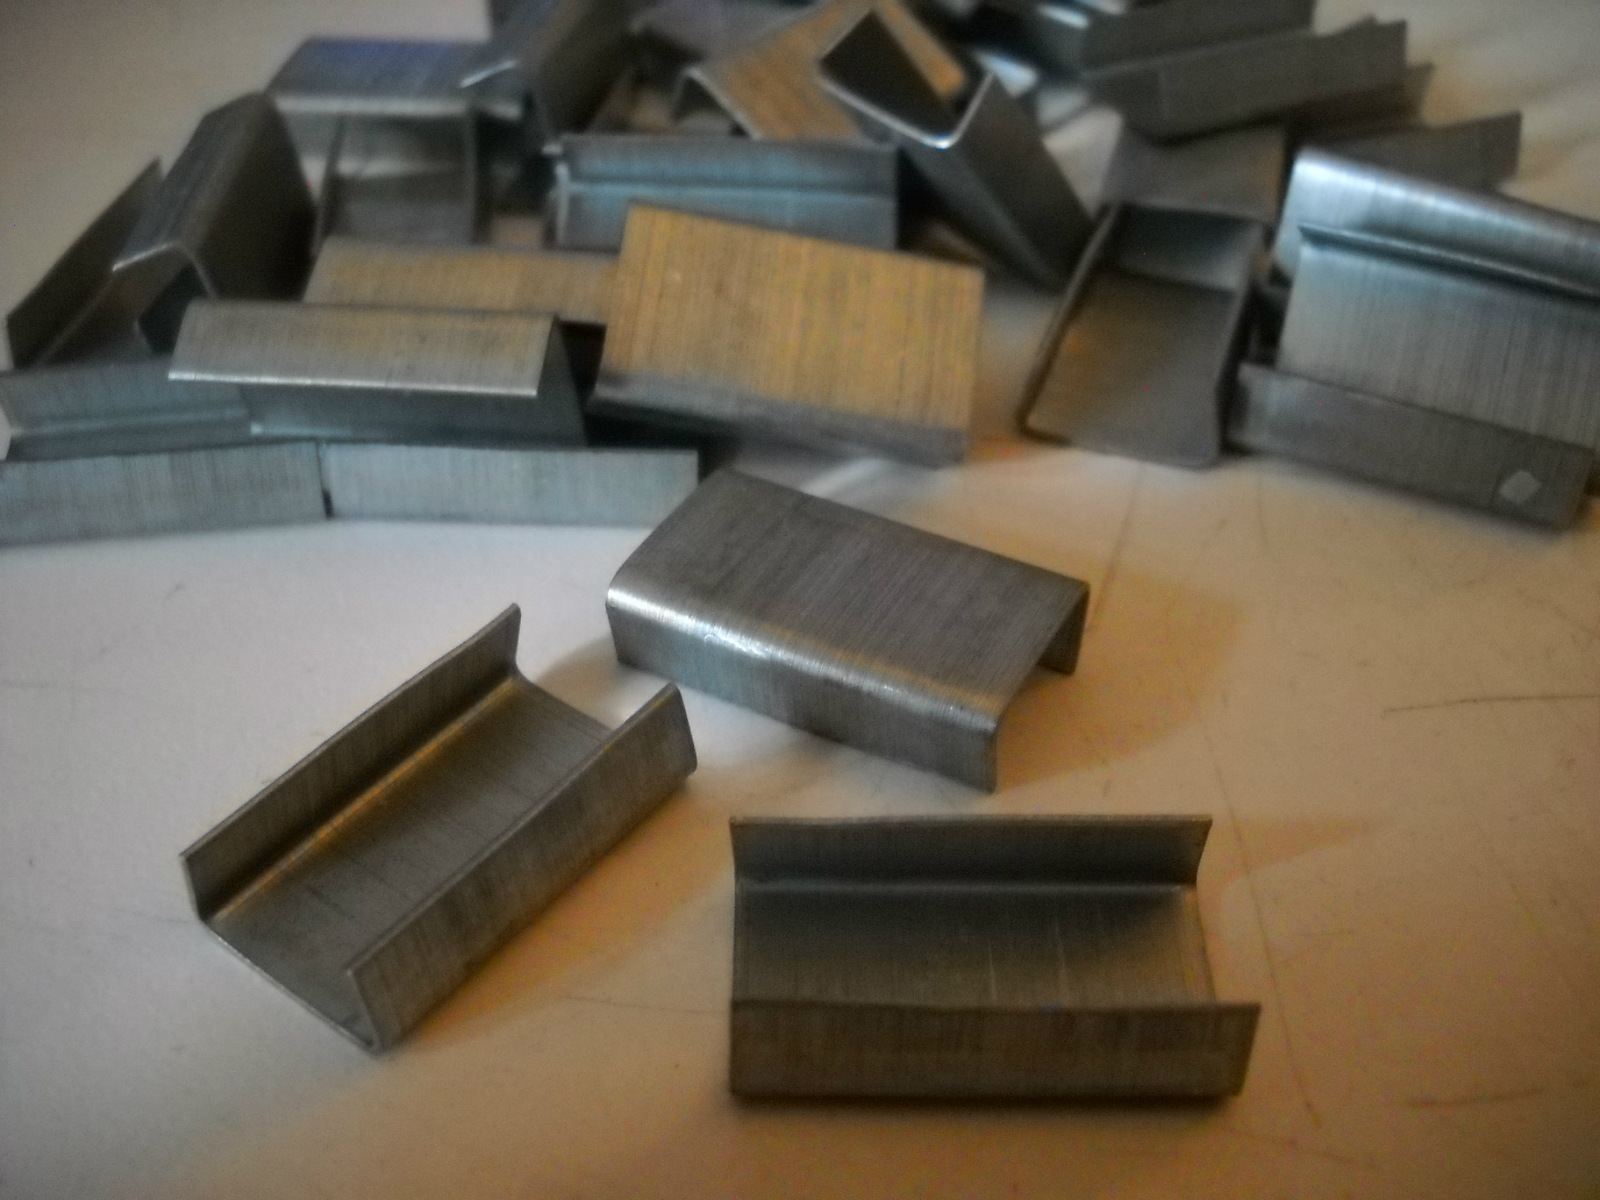 Box of 5,000 New Packaging Open Metal Steel Seals